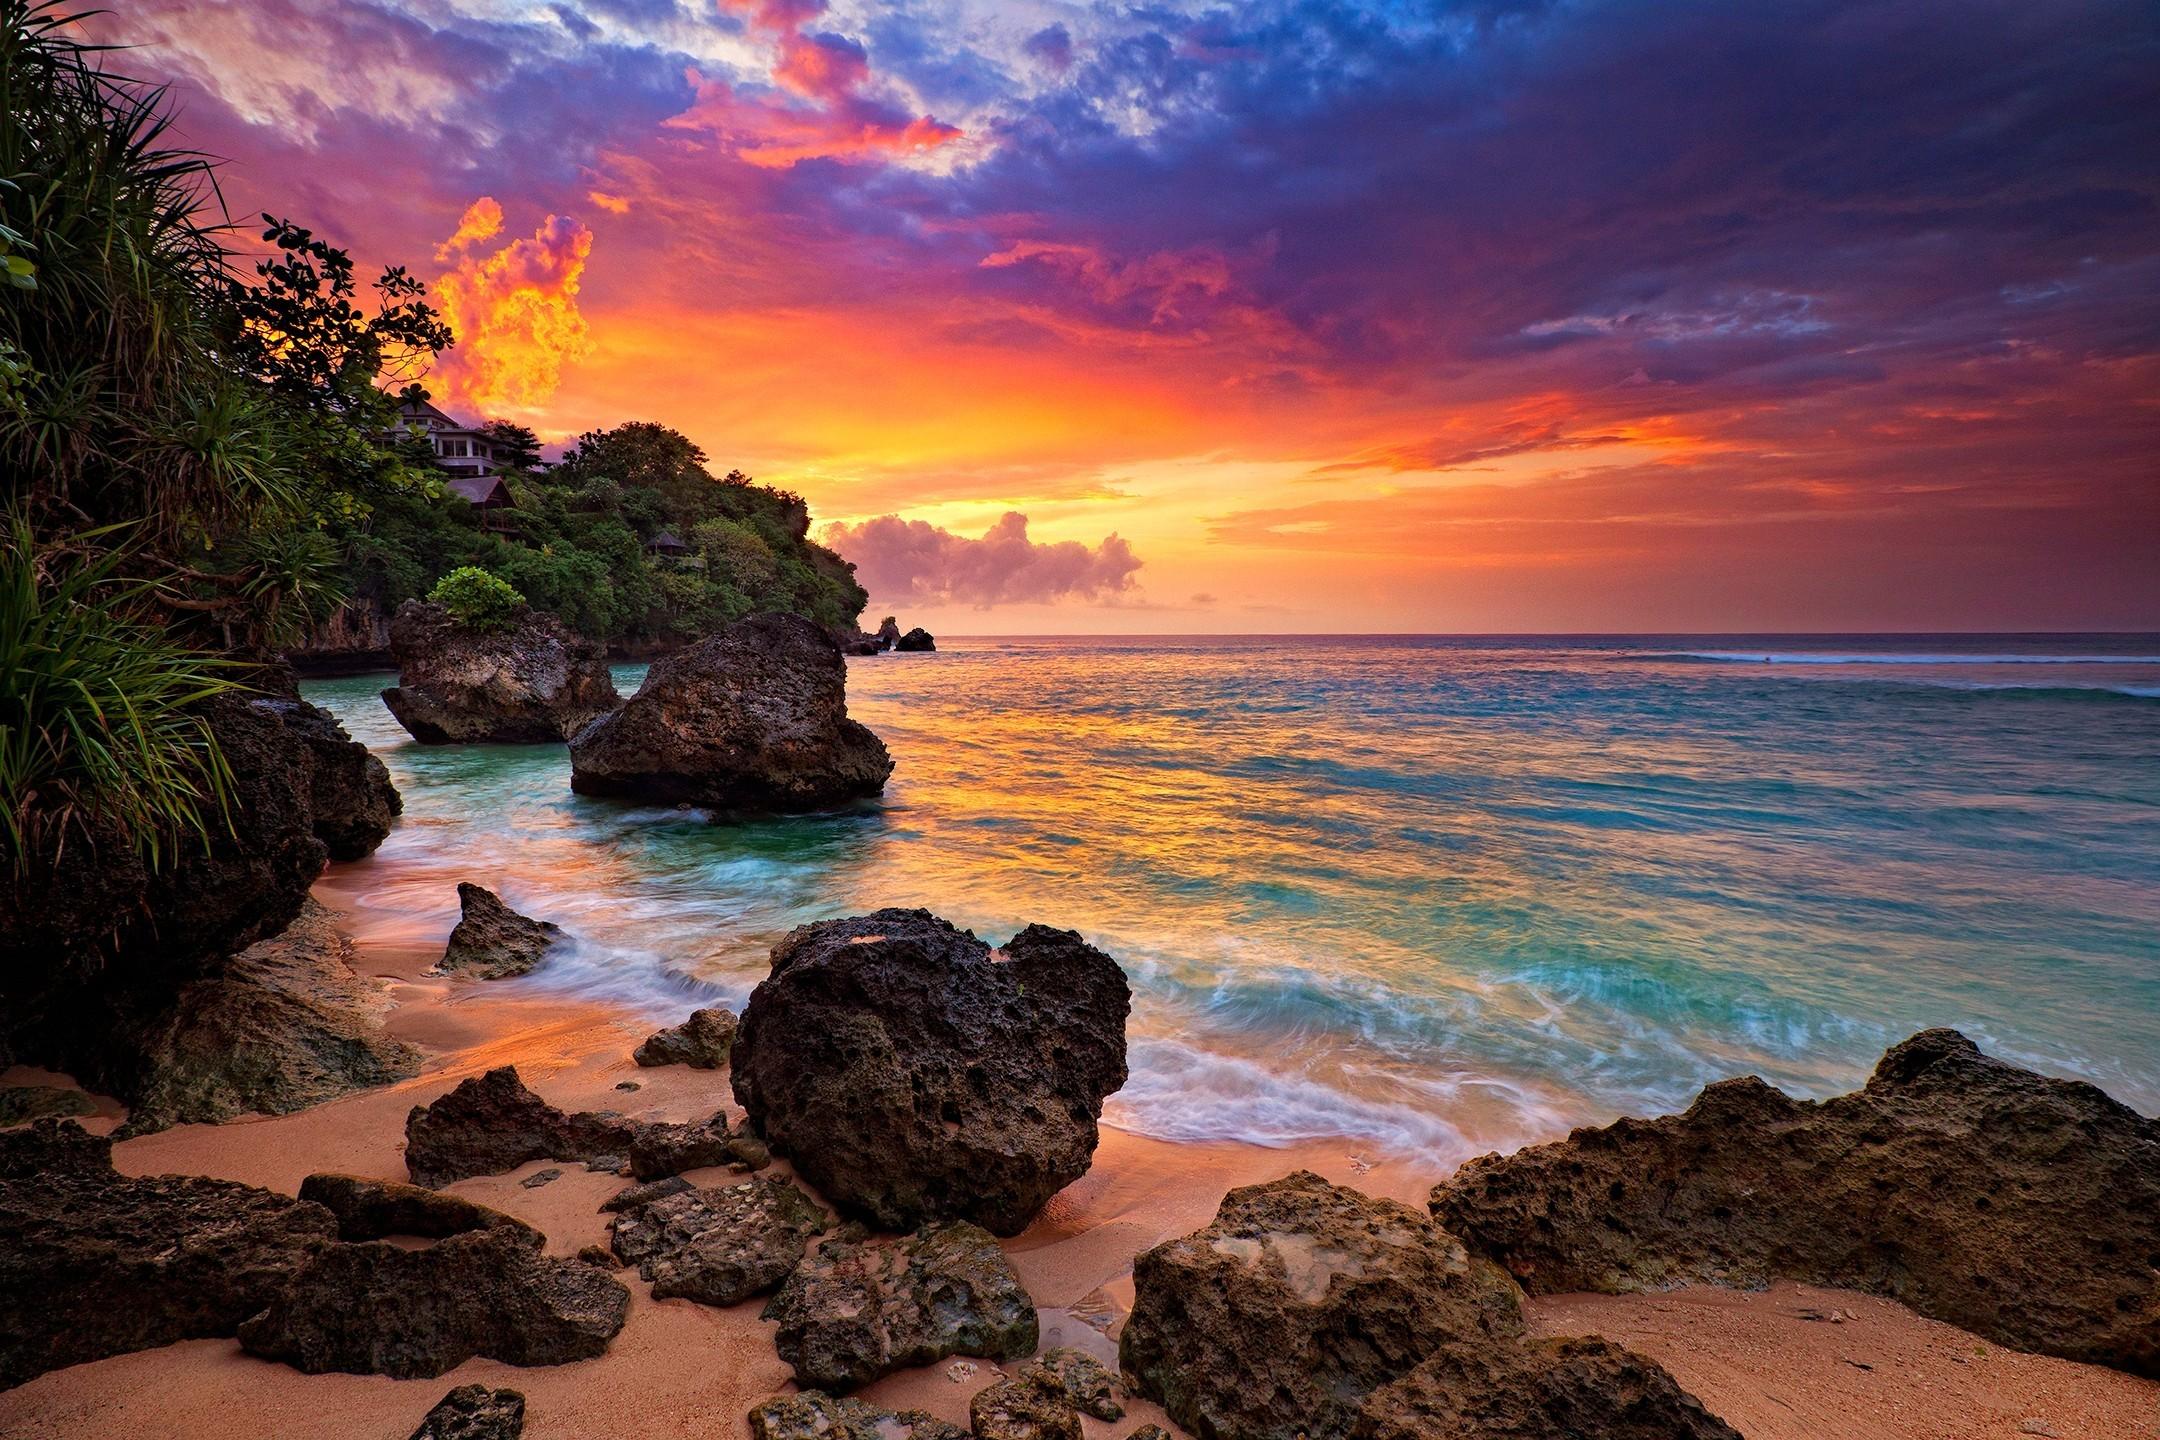 Beach Sky Sunset Rocks Clouds Hidden Ocean Bali Trees Waves Sand Indonesia  Island House Beautiful Beaches